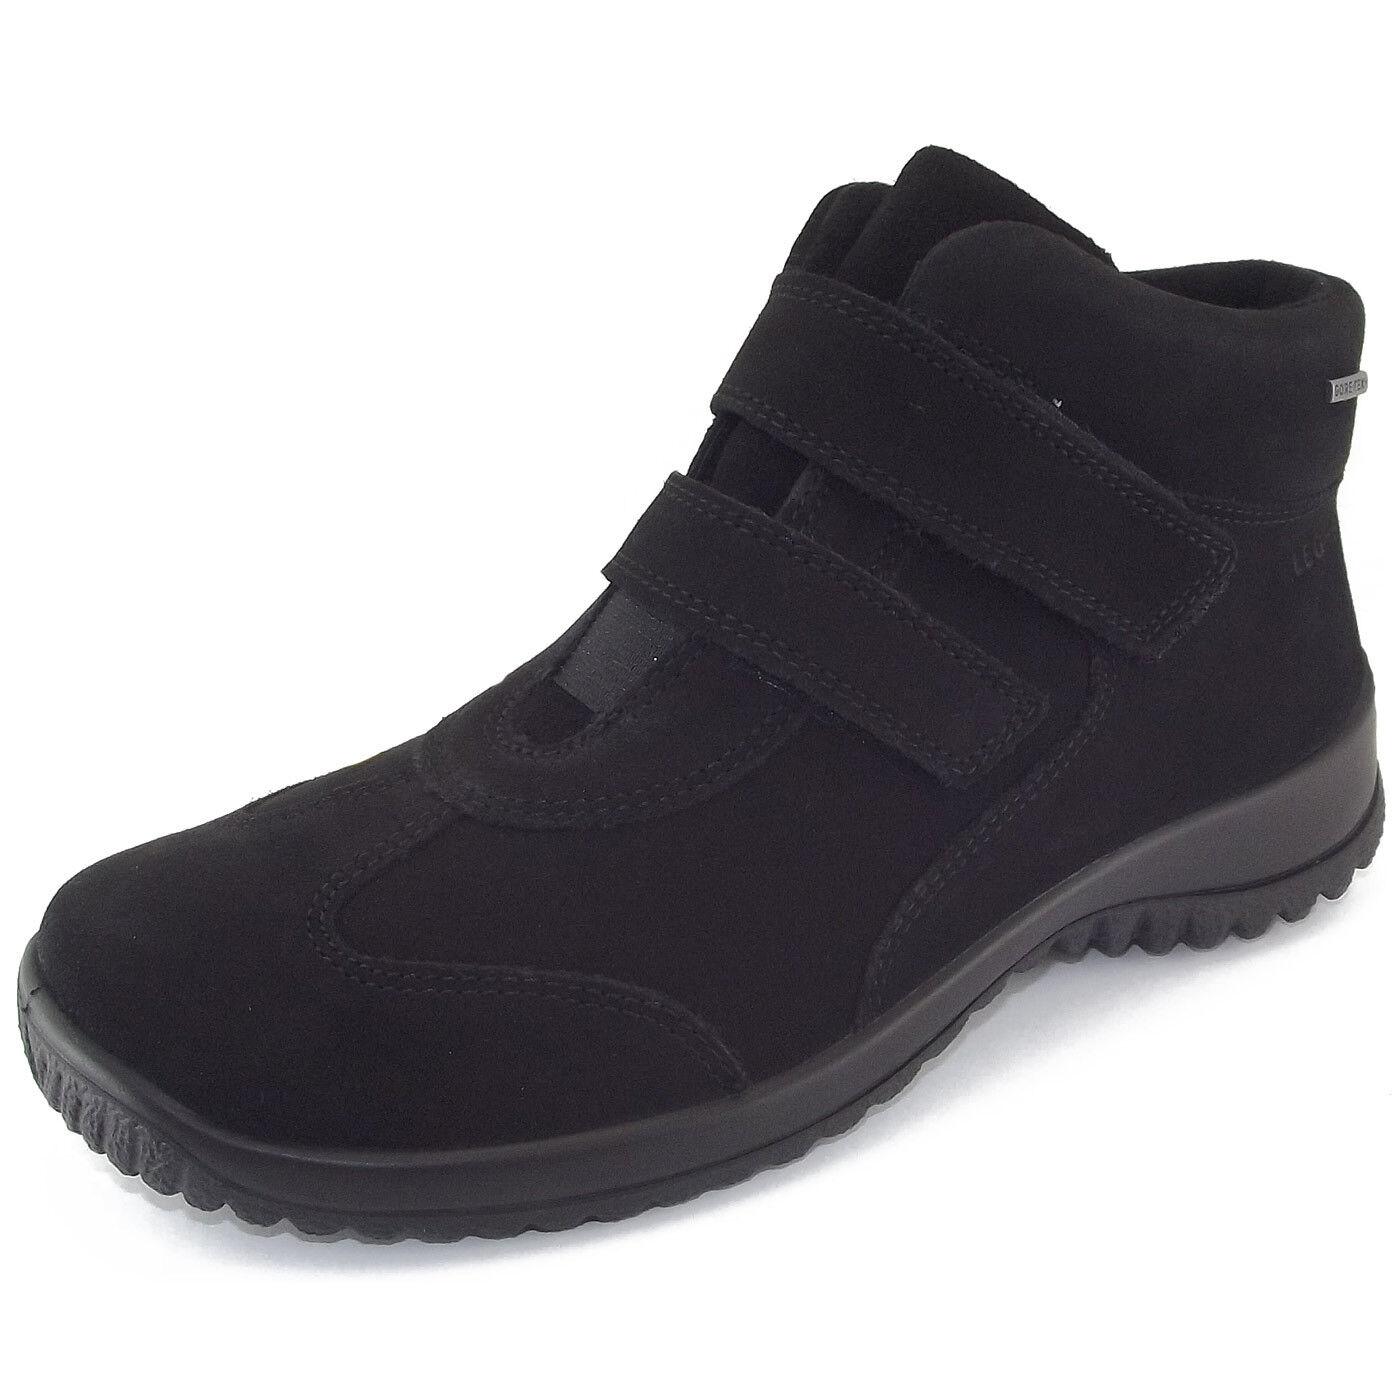 Legero Gore-Tex Softboot Klett Damen Damen Klett Sneaker-Stiefel schwarz 27912d